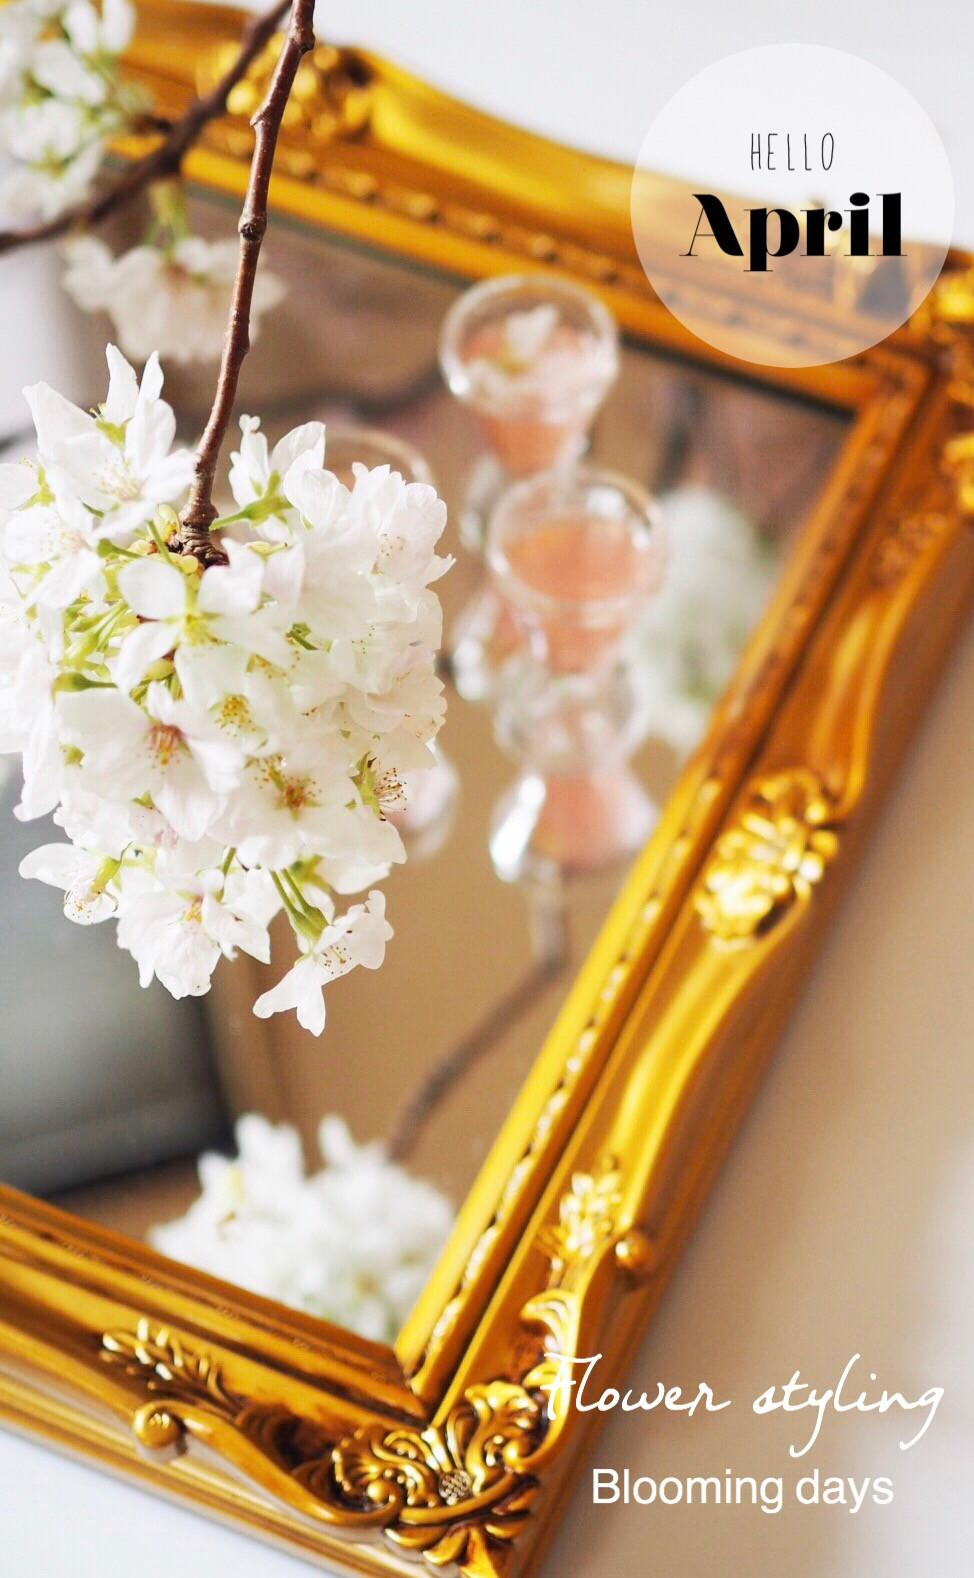 Flower styling 花のある暮し 桜